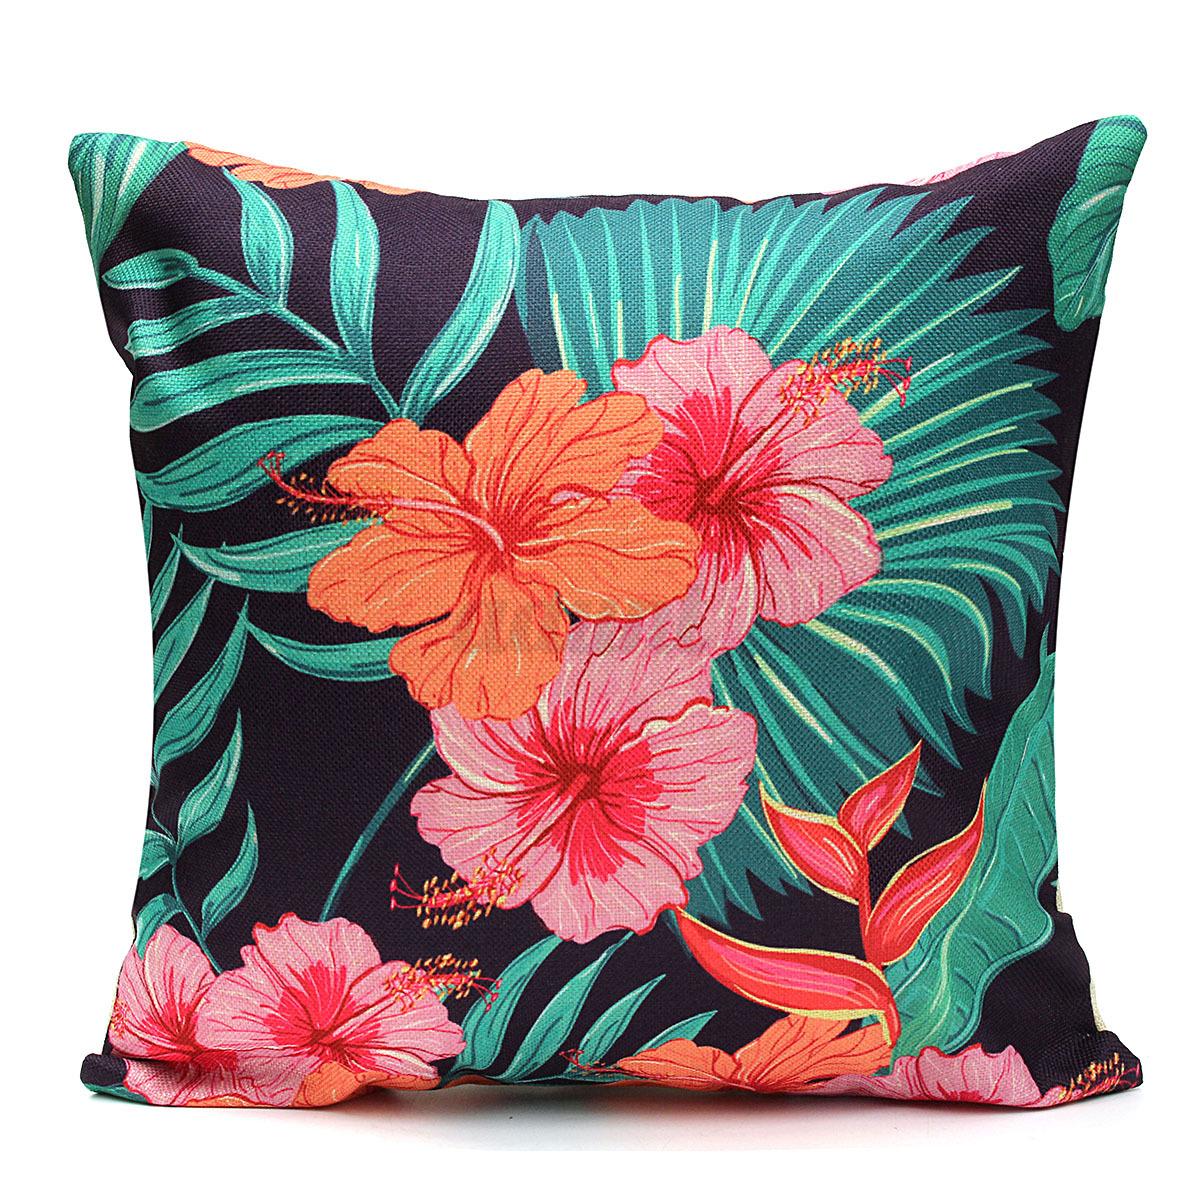 Home Decor Vintage Cotton Linen Pillow Case Sofa Waist Throw Cushion Solid Cover